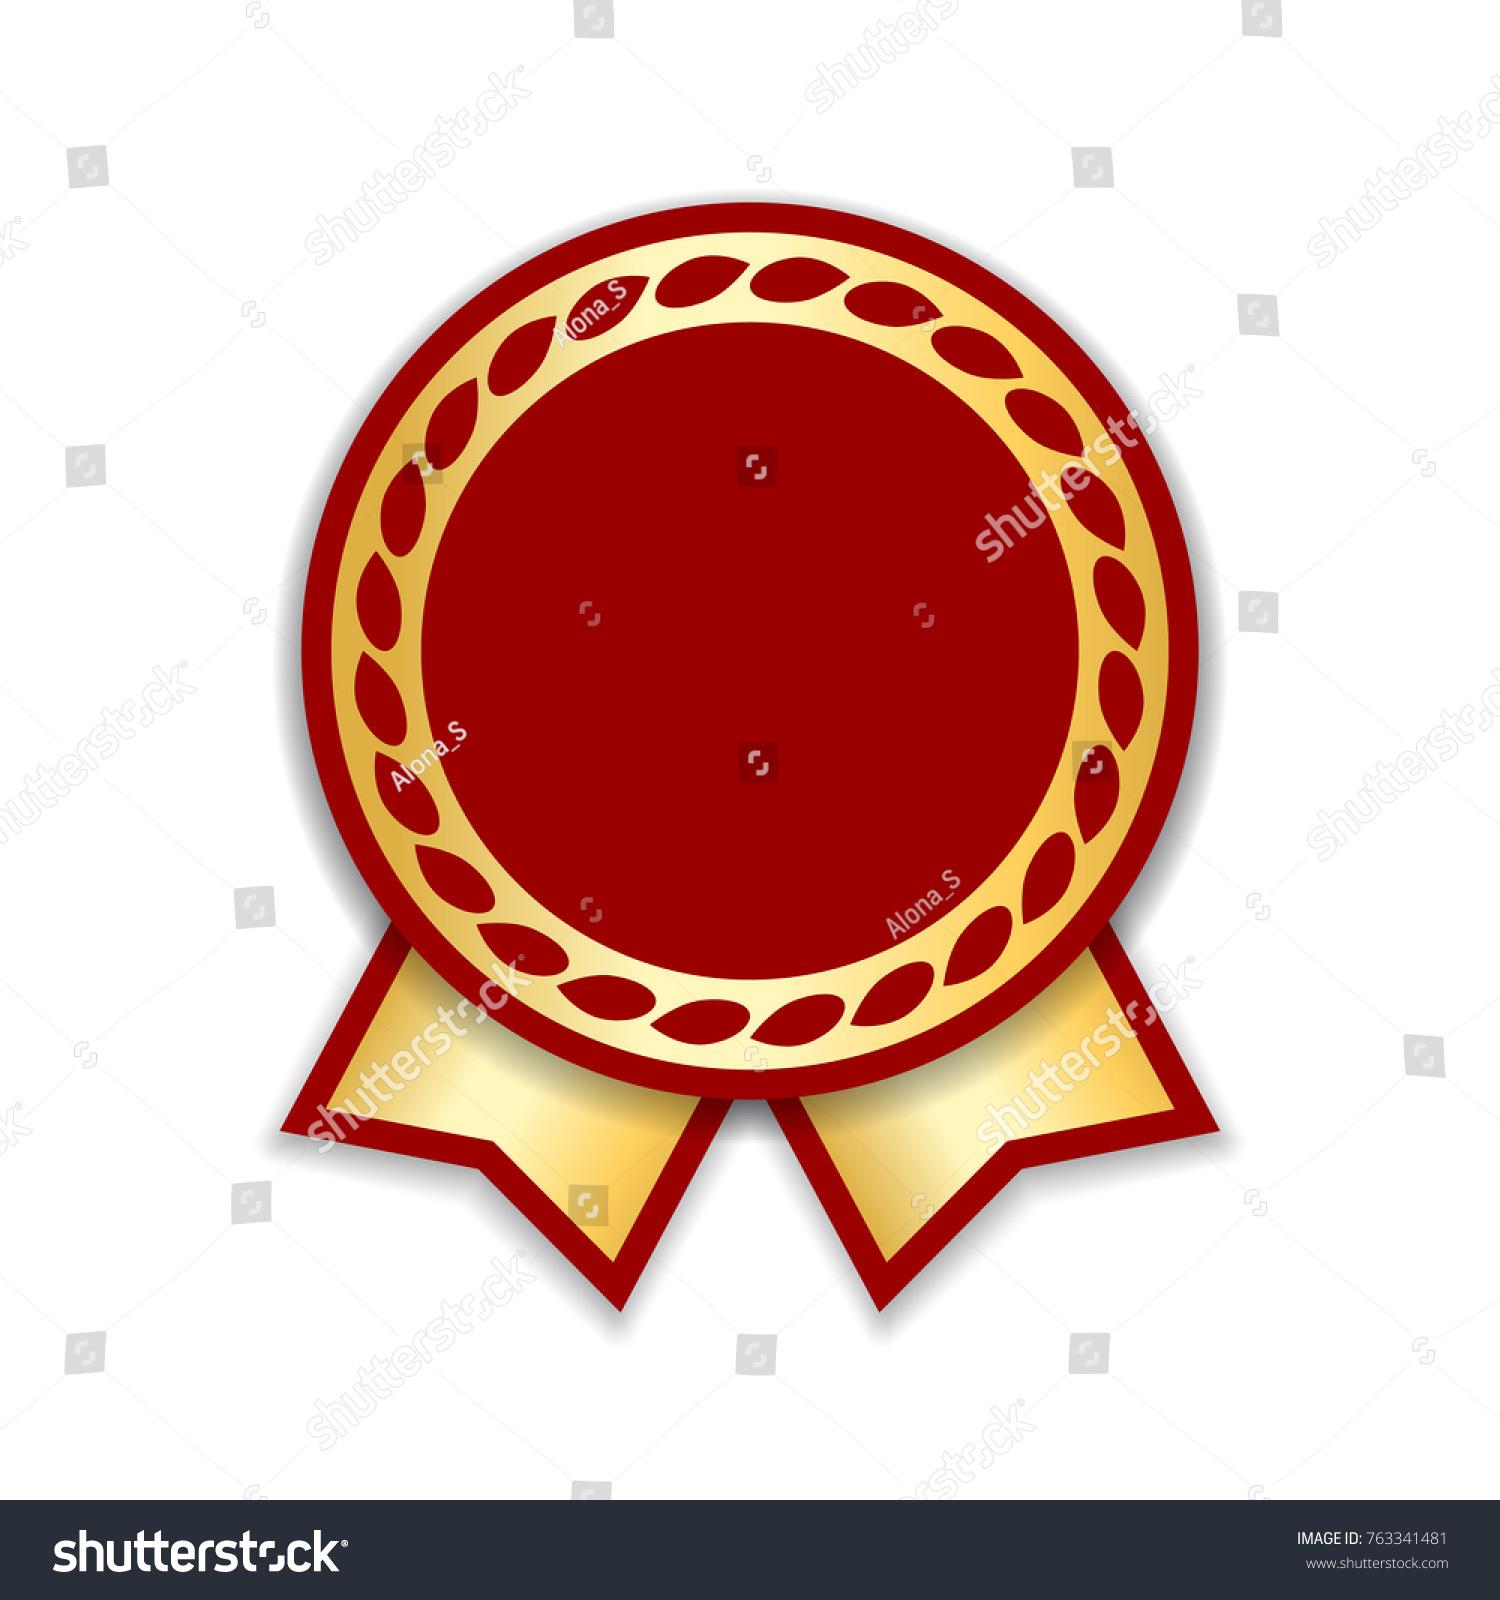 Award ribbon isolated gold red design stock vector 763341481 award ribbon isolated gold red design medal label badge certificate symbol buycottarizona